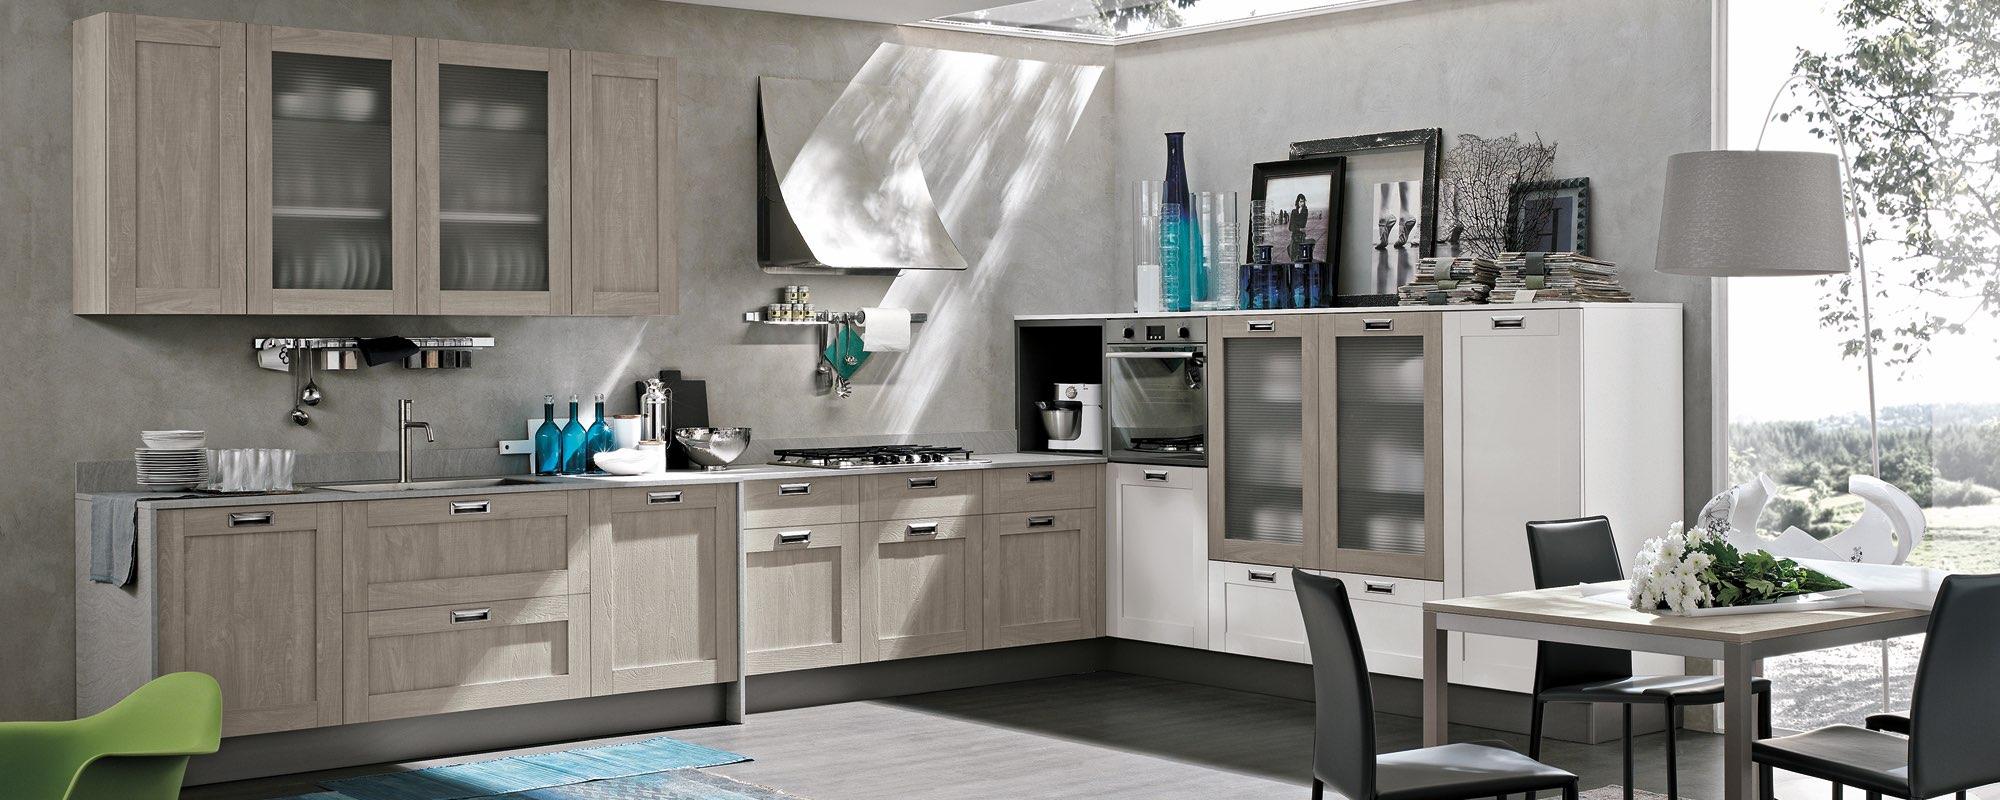 cucina moderna-CITY